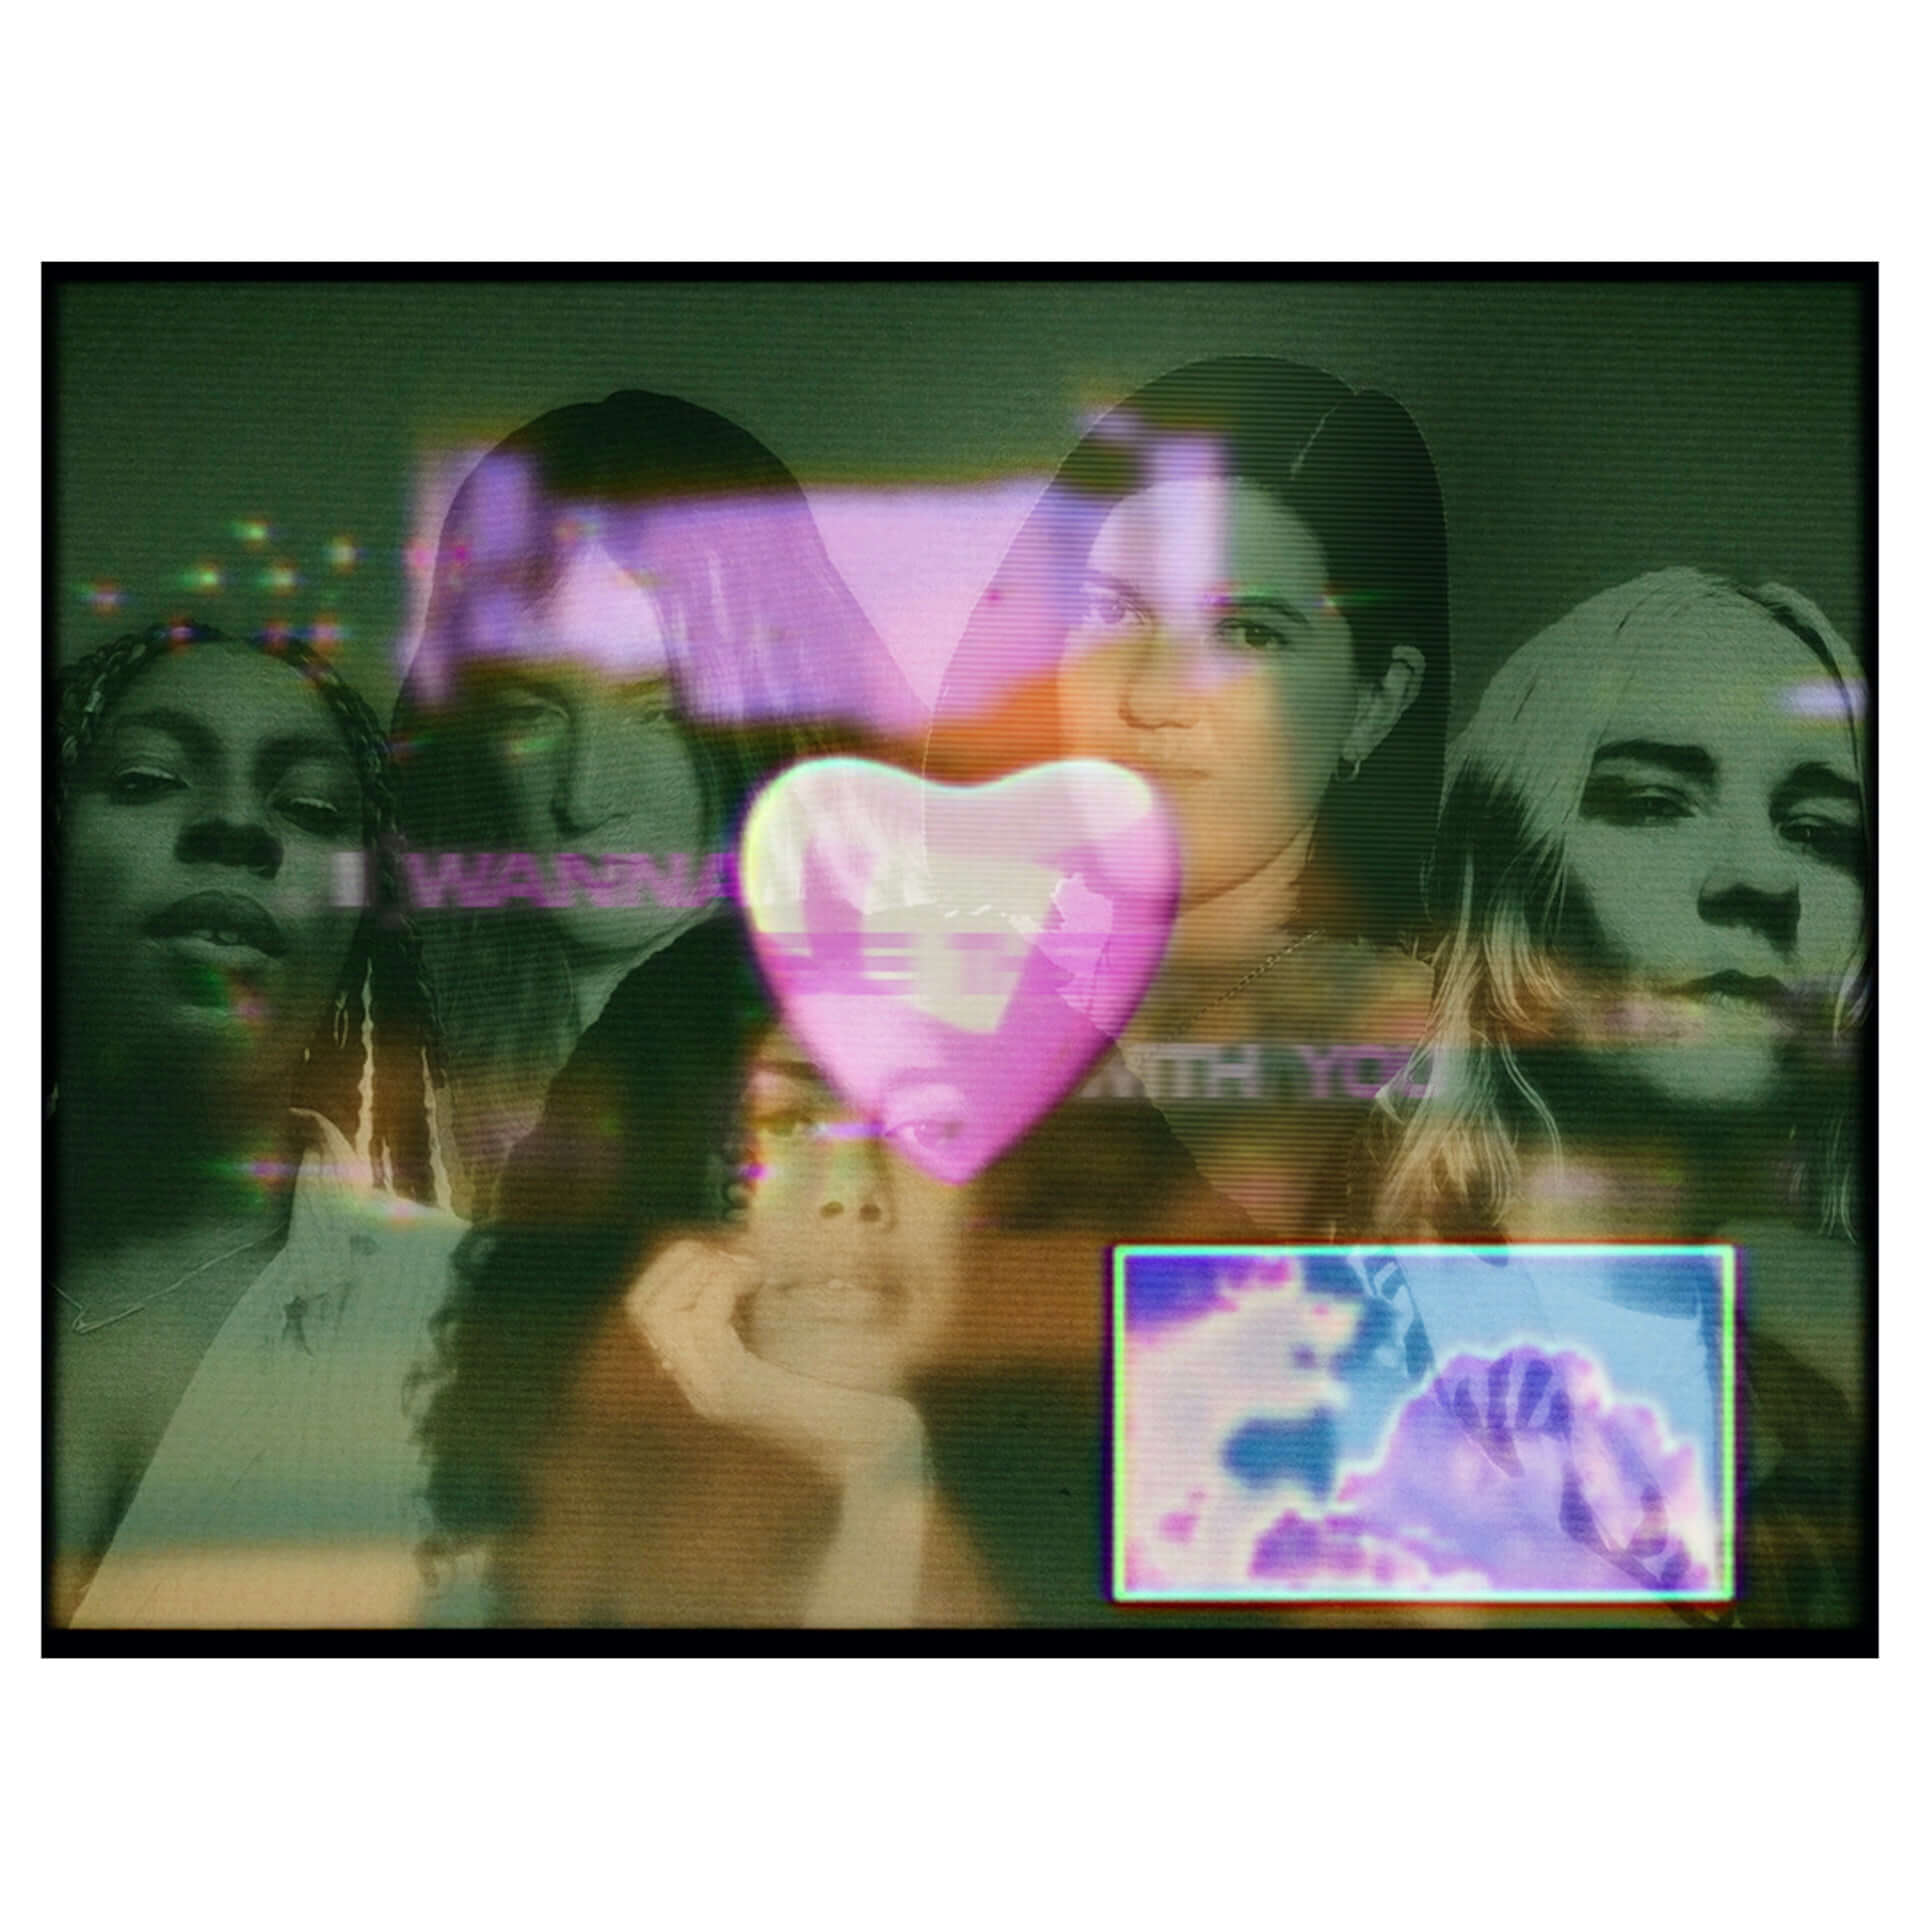 "The xxのRomyがソロデビュー曲""Lifetime""のリミックス集をリリース!Jayda G、HAAi、Anz、Planningtorockが参加&コメントも到着 music201203_romy_1-1920x1920"